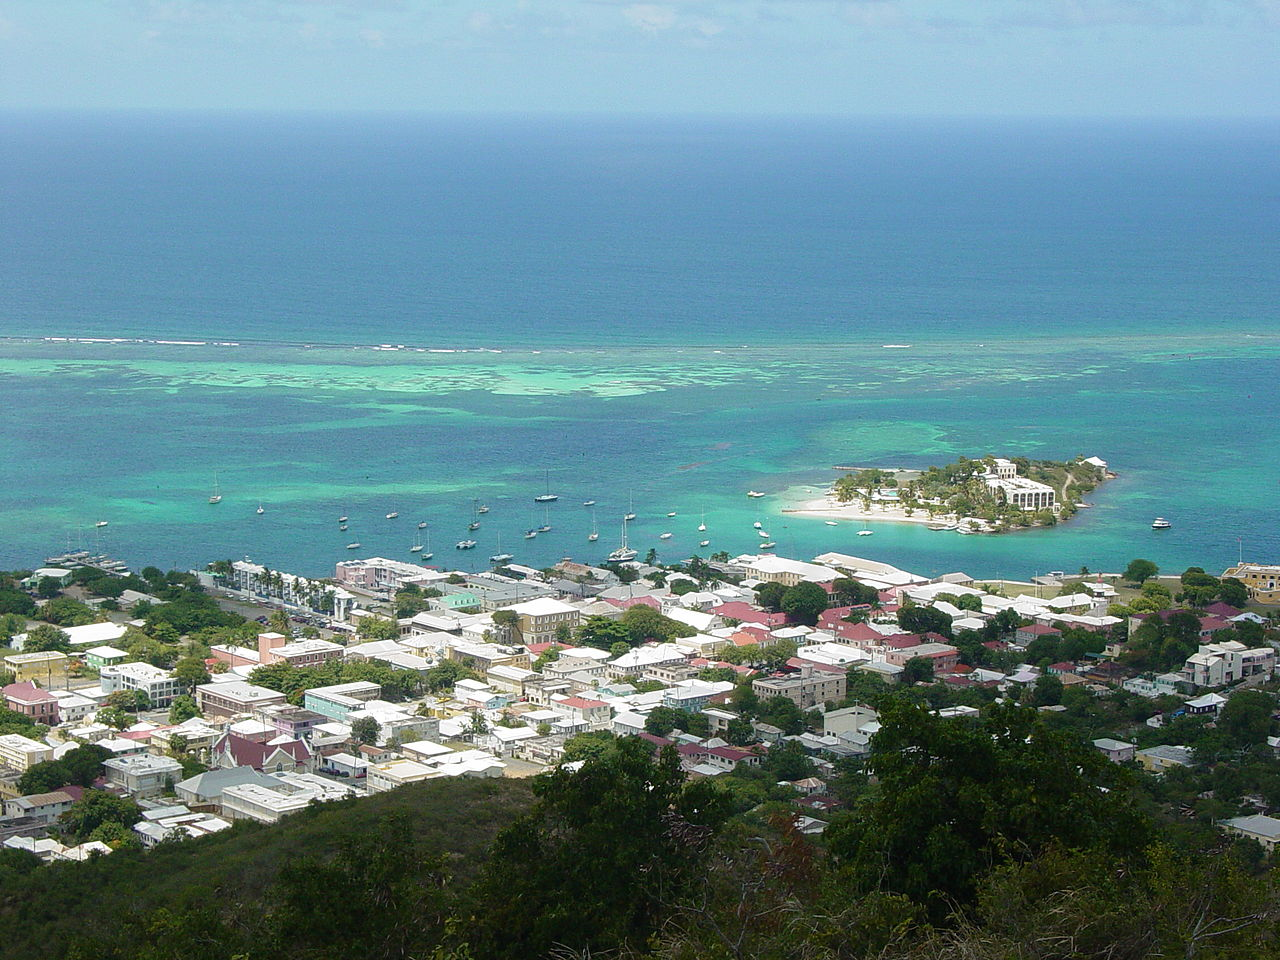 23 Best Things to do in St. Croix U.S. Virgin Islands